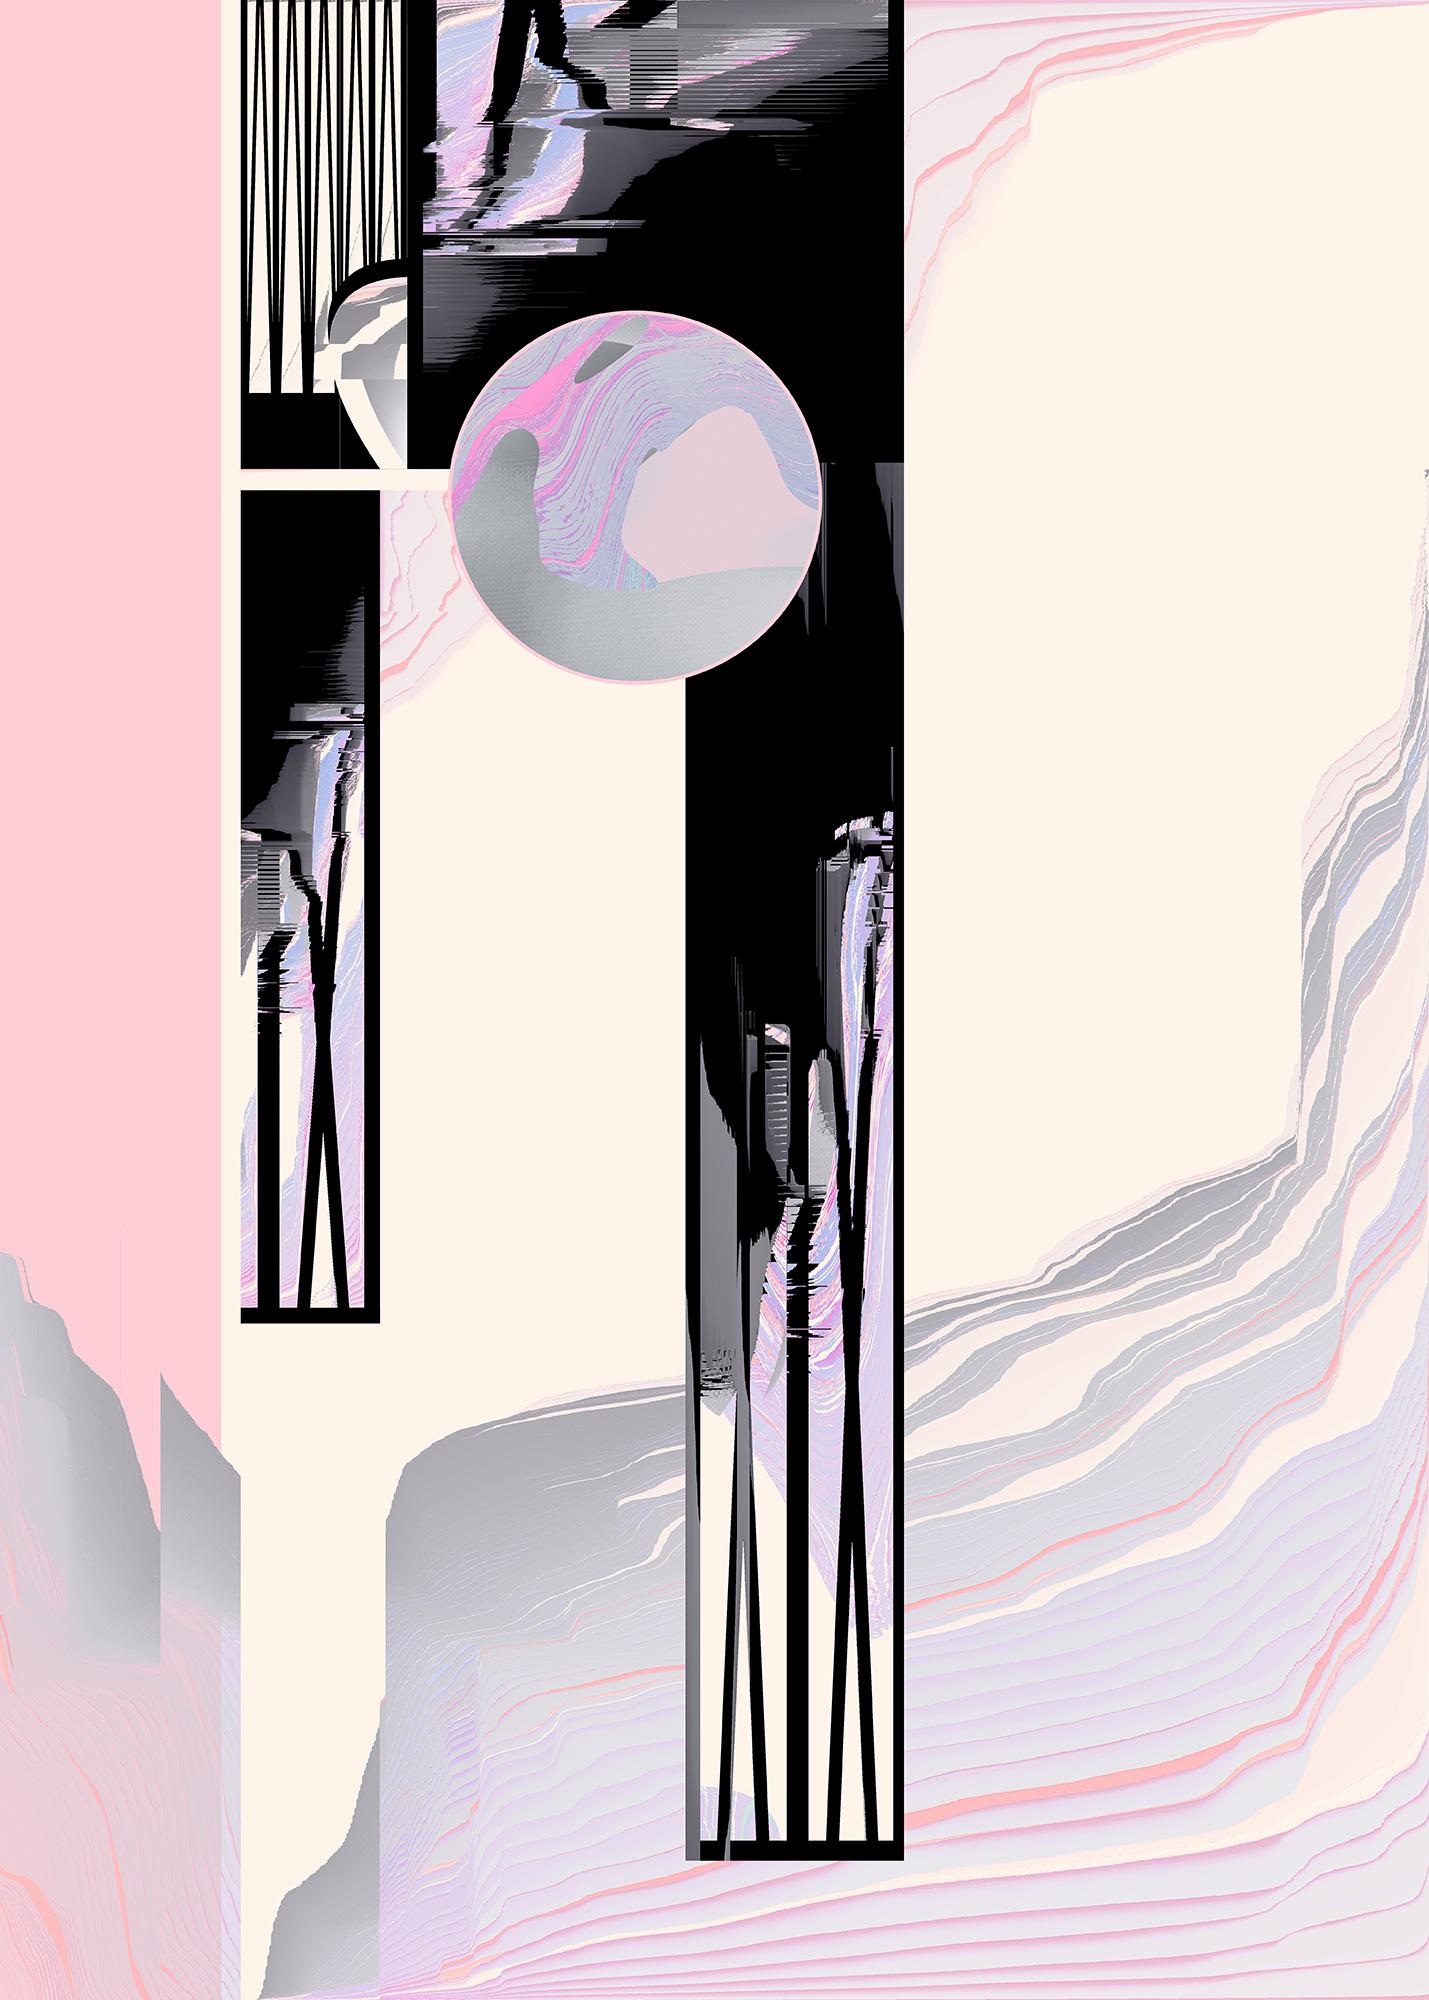 Ewa Doroszenko – Composition with the Sun online 10, obraz